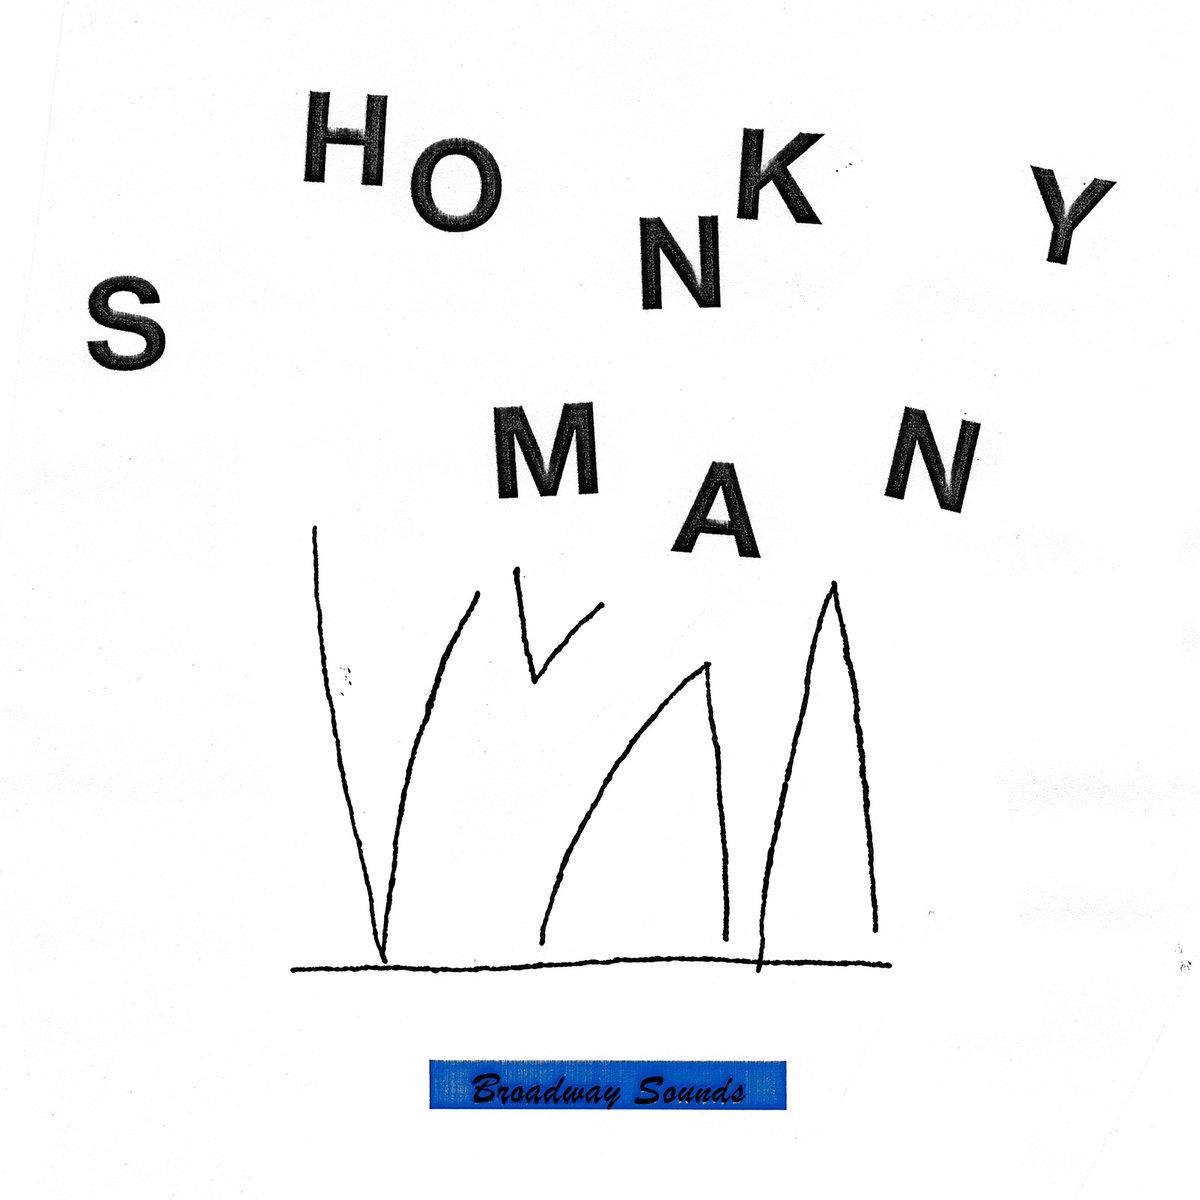 BROADWAY SOUNDS - SHONKY MAN - PAZ & LEWIS CANCUT REMIX2016